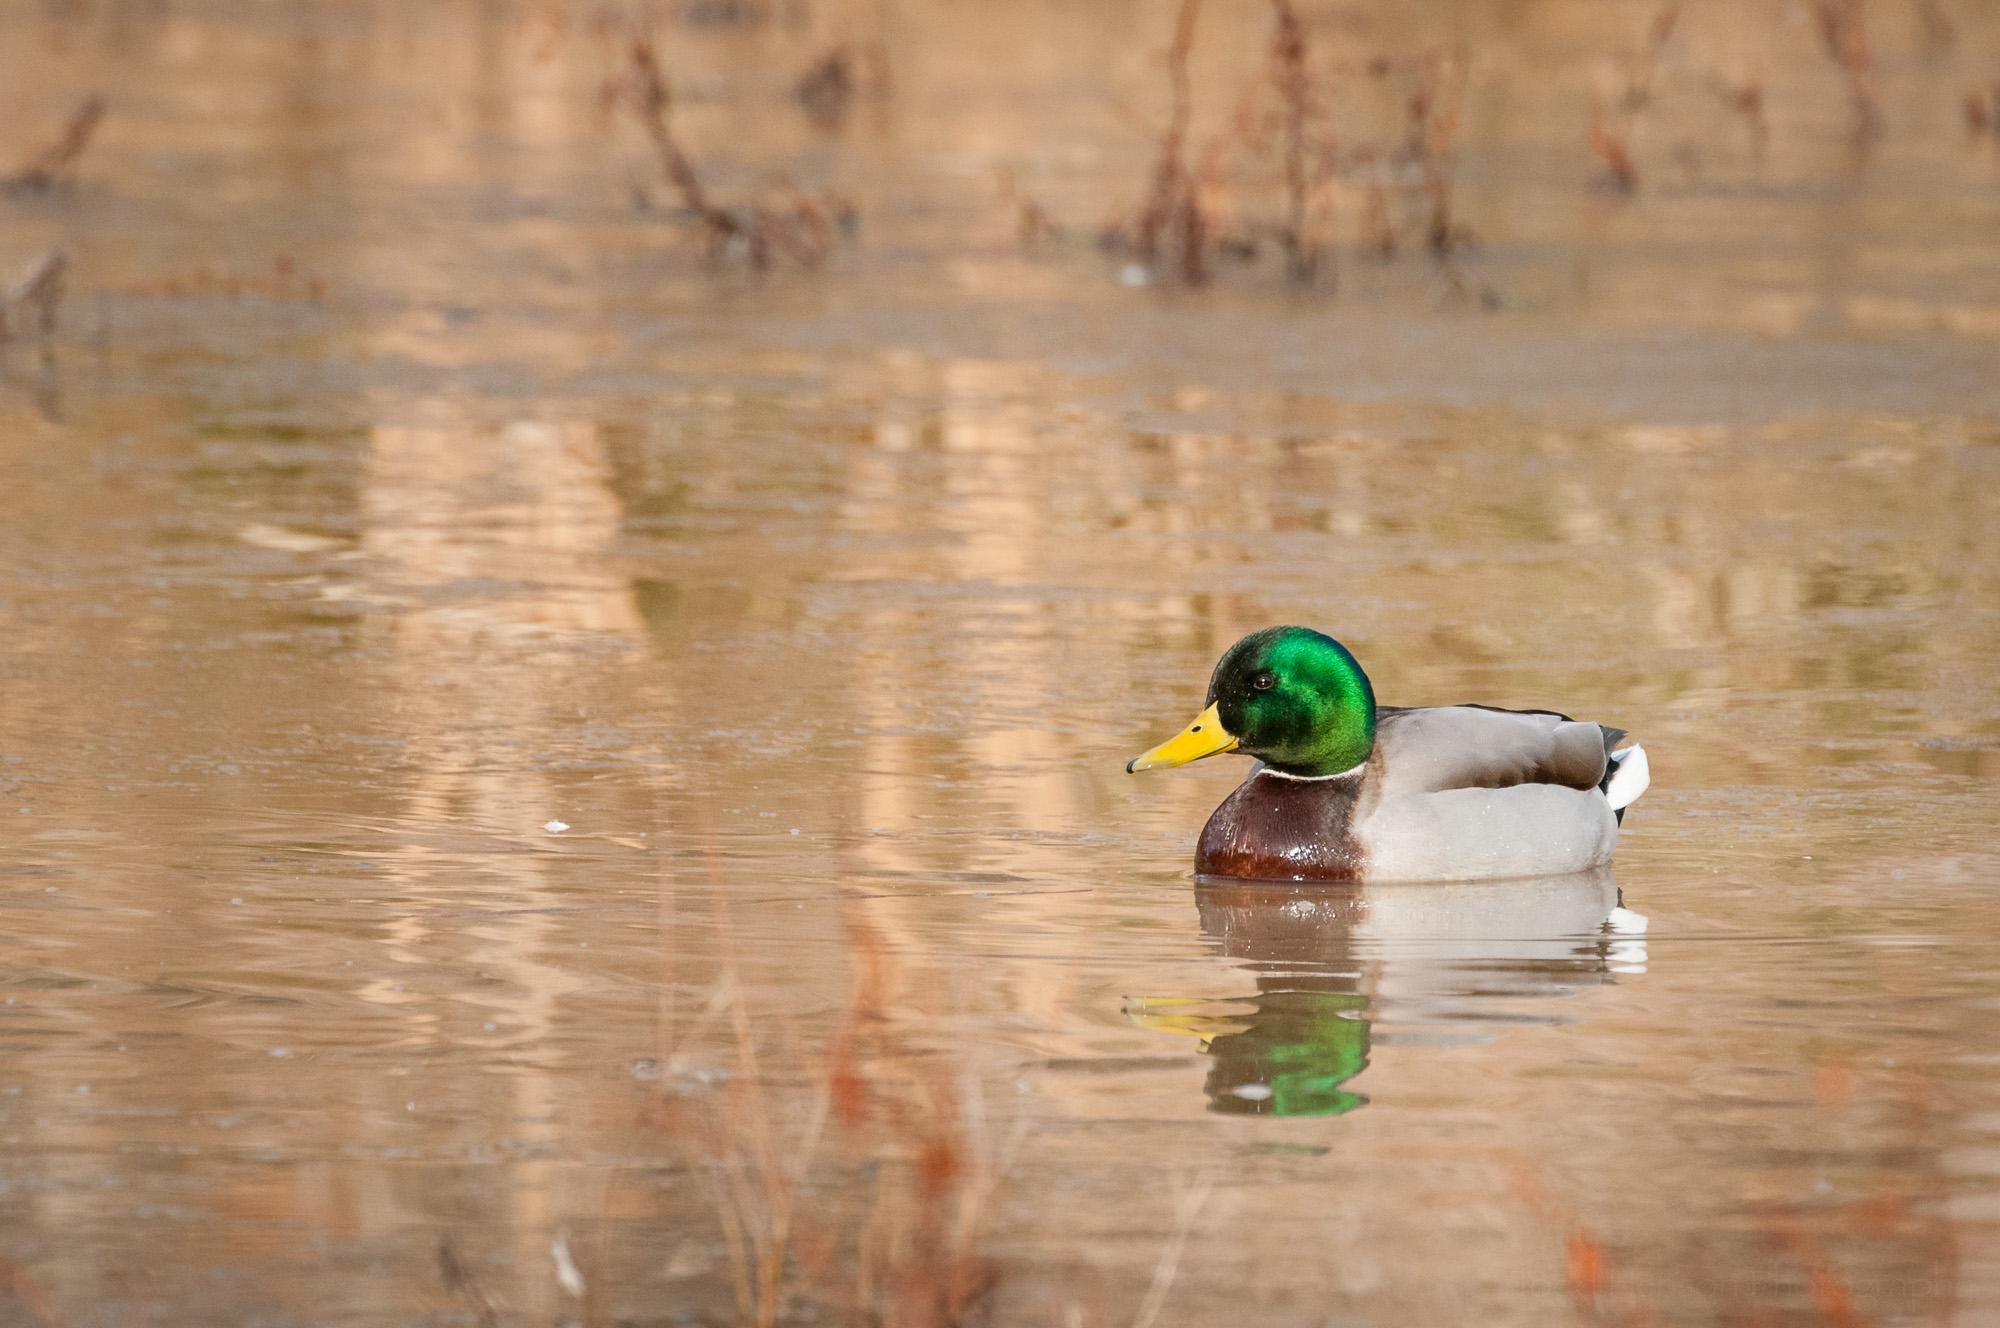 A lone mallard swimming in the wetlands.